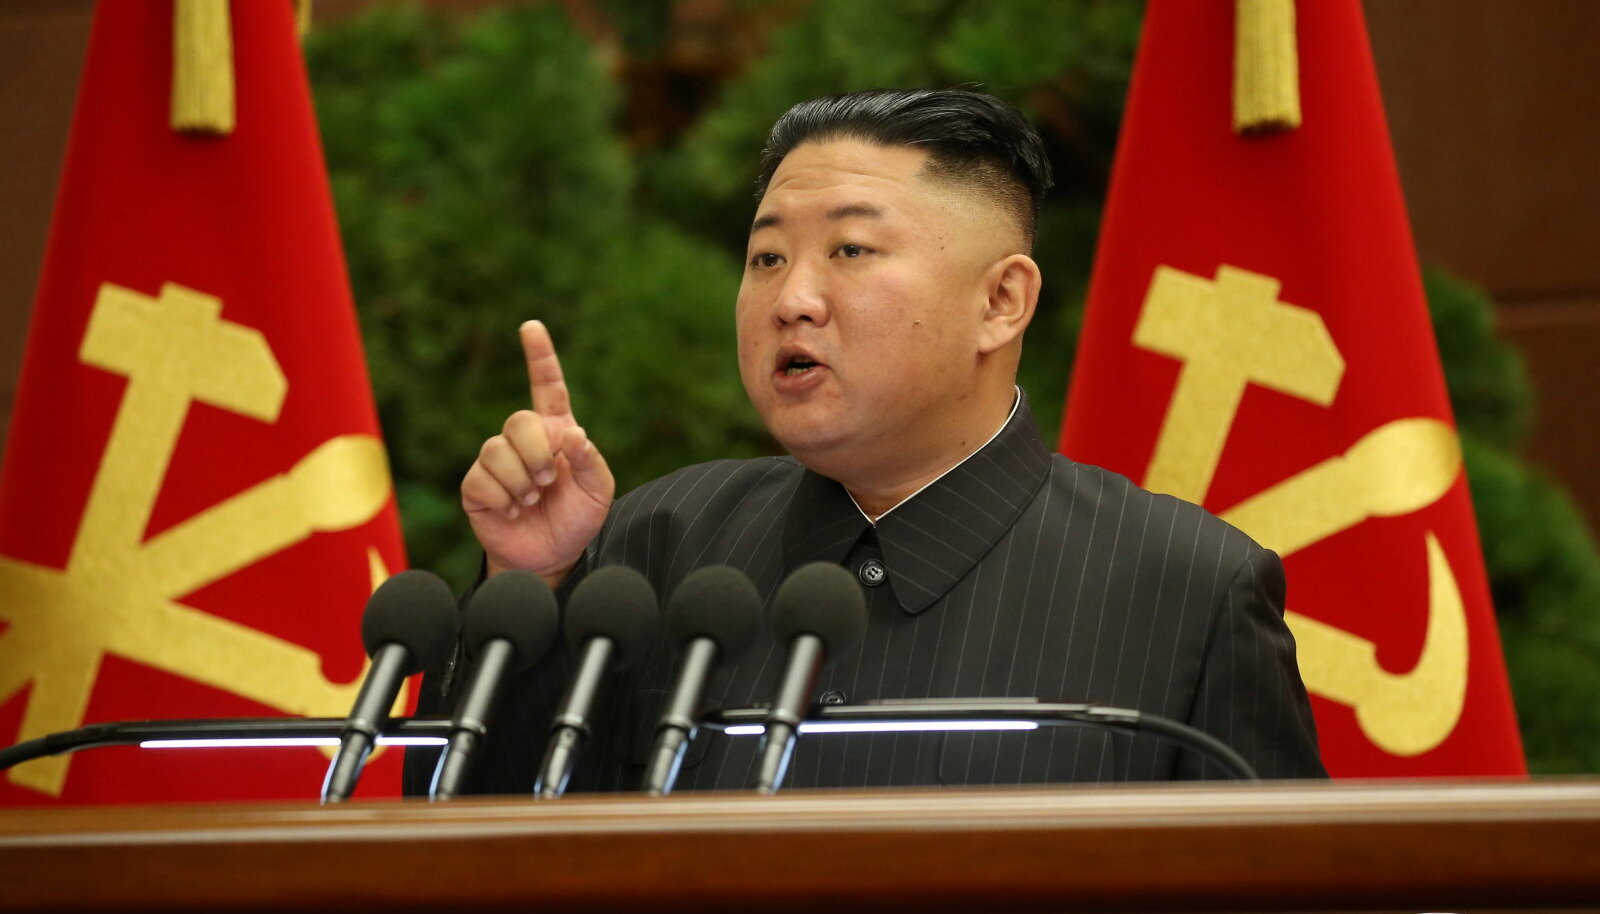 Kim Jong-un 5. juulil poliitbüroole kõnet pidamas